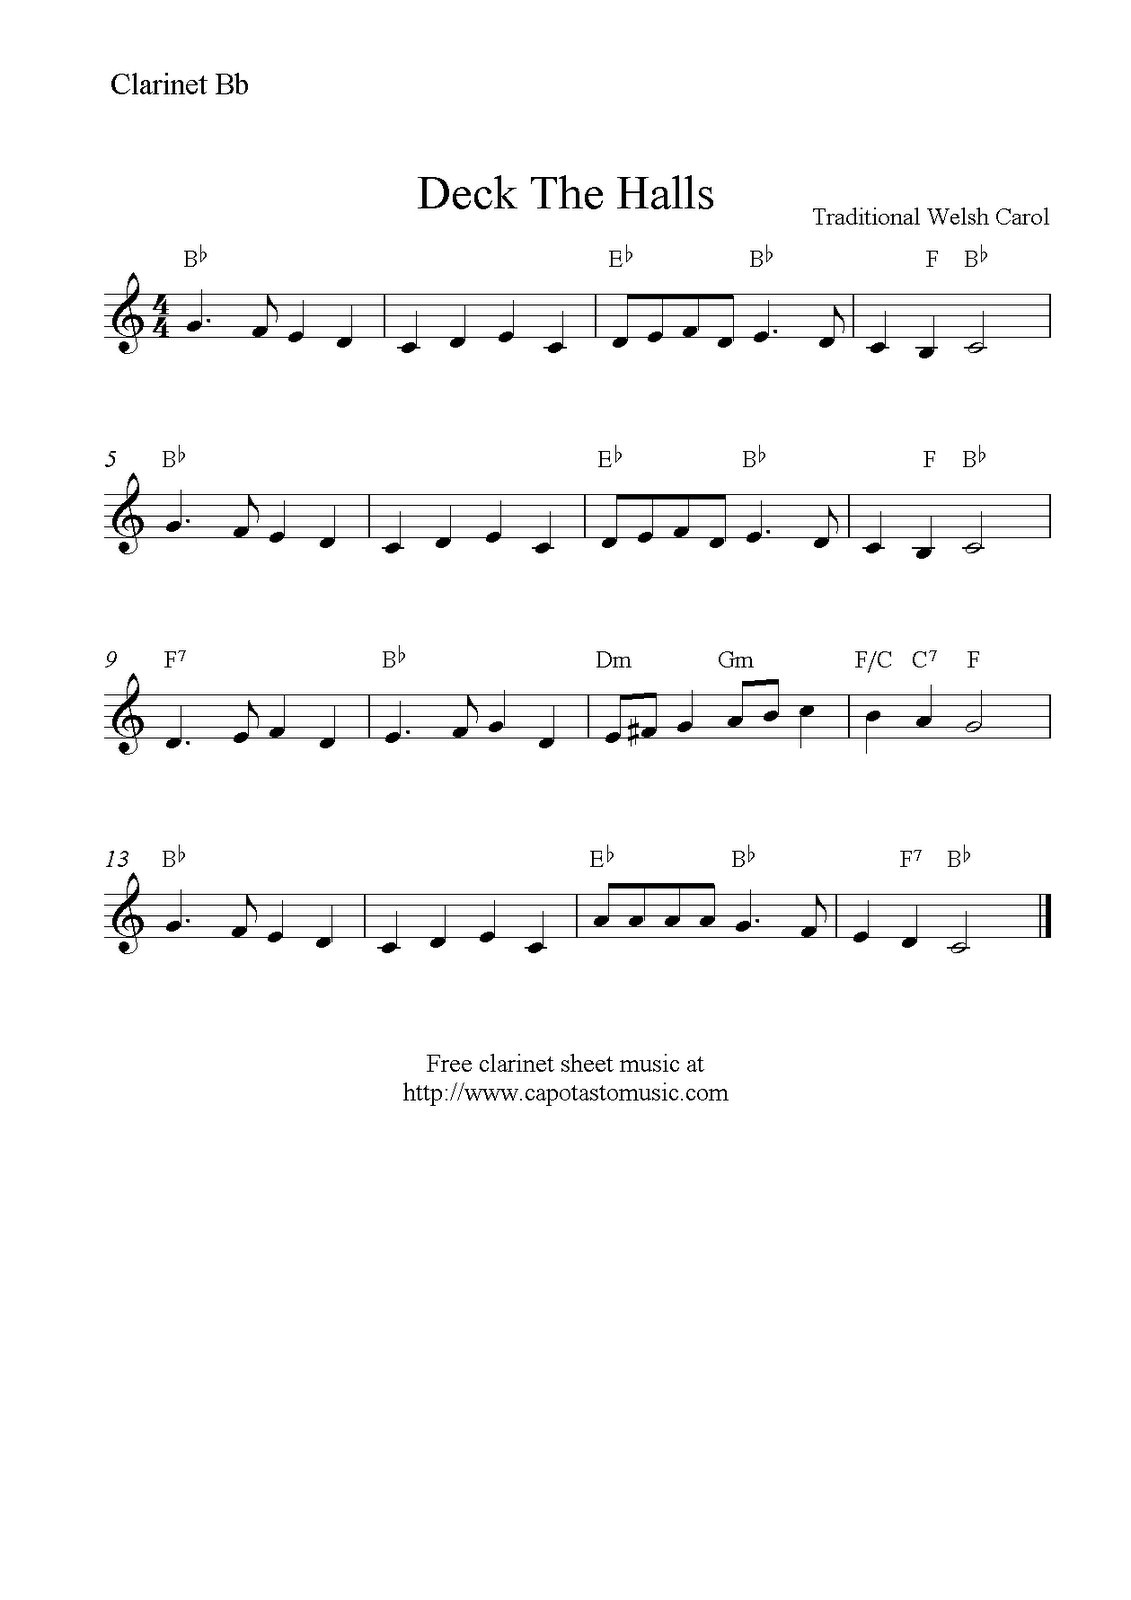 Christmas Clarinet Sheet Music Free - Google Search | Music - Free Printable Christmas Songs For Clarinet